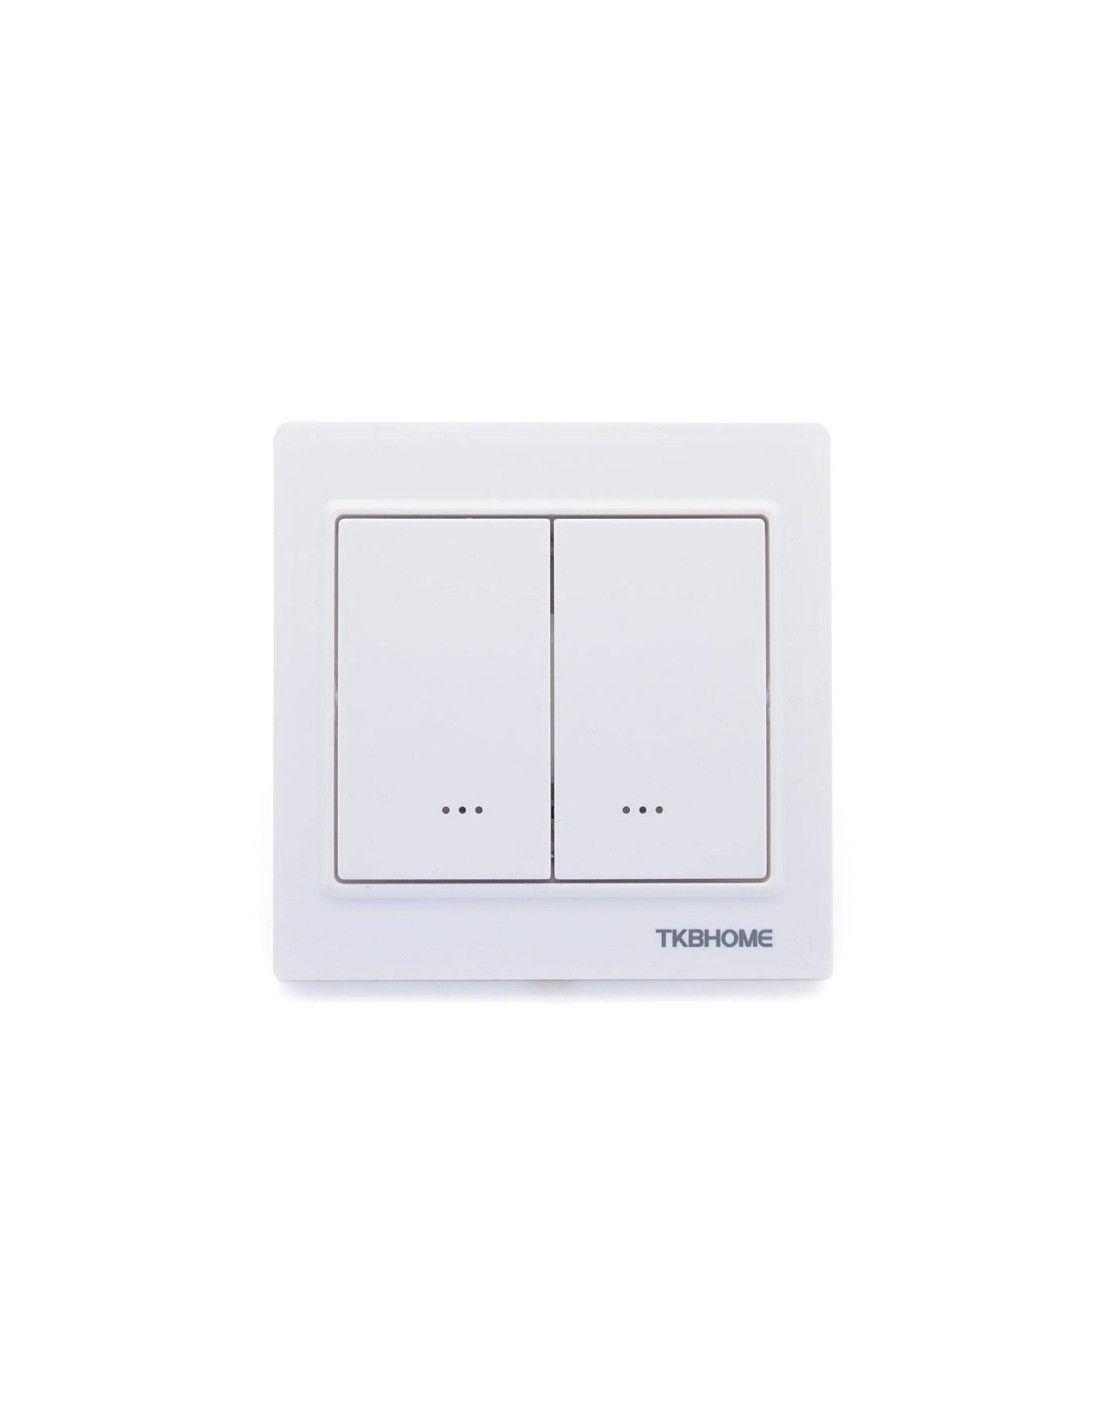 TKB Home - Doppel-Schalter (1 Last) Z-Wave+ Weiss (TZ56D-ZW5)